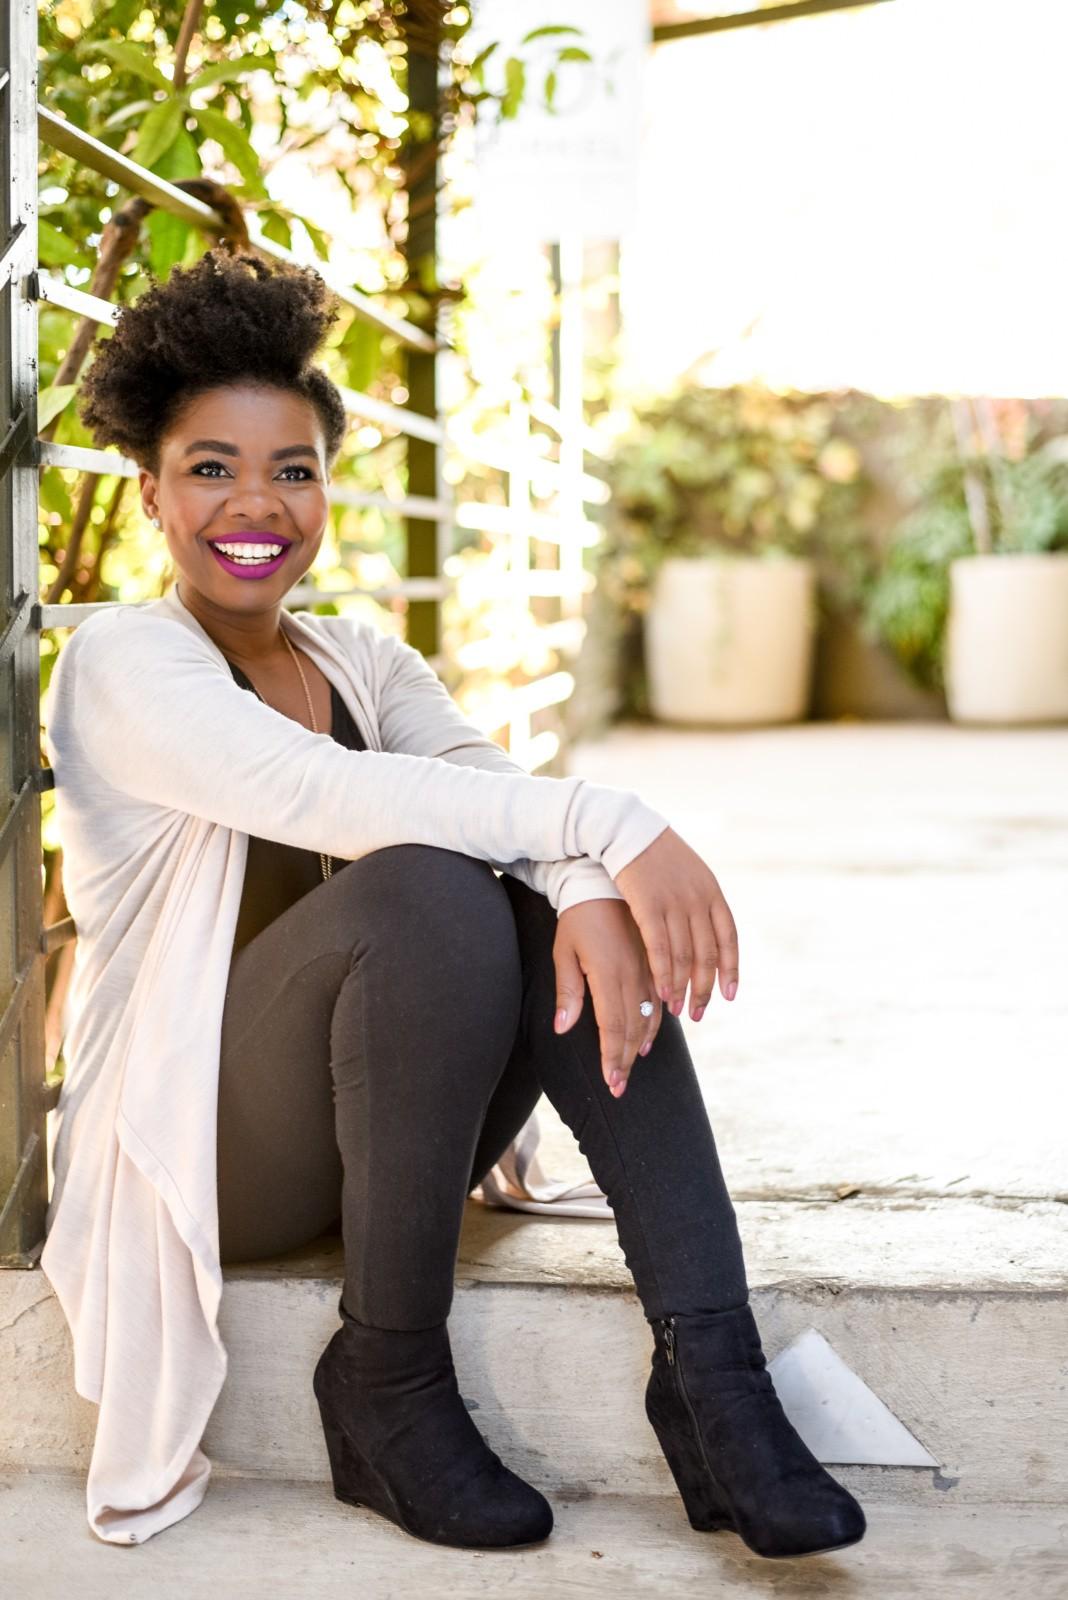 Life-with-Aisha-blog-RobynDaviePhotography-44STANLEY-AISHA-47